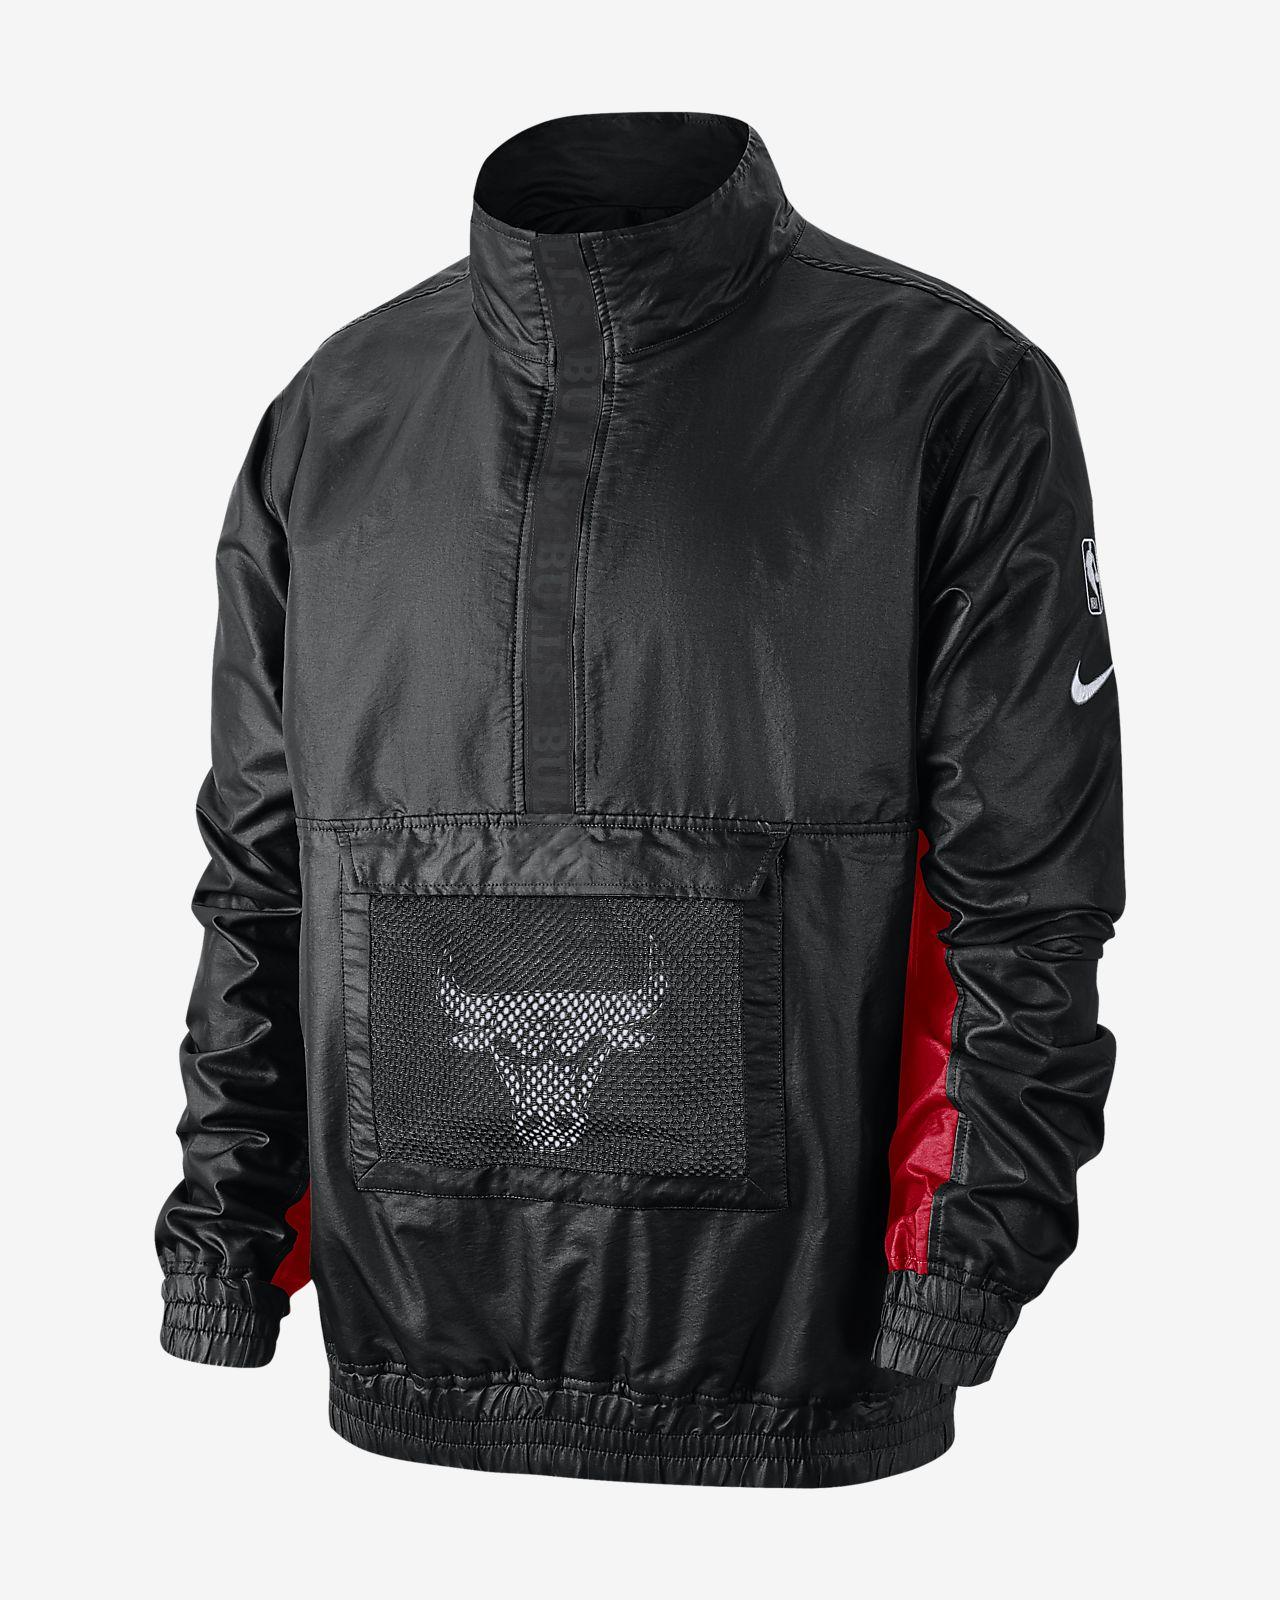 Lightweight Chicago Bulls Jacket Men's Nba Nike n0vwmNO8